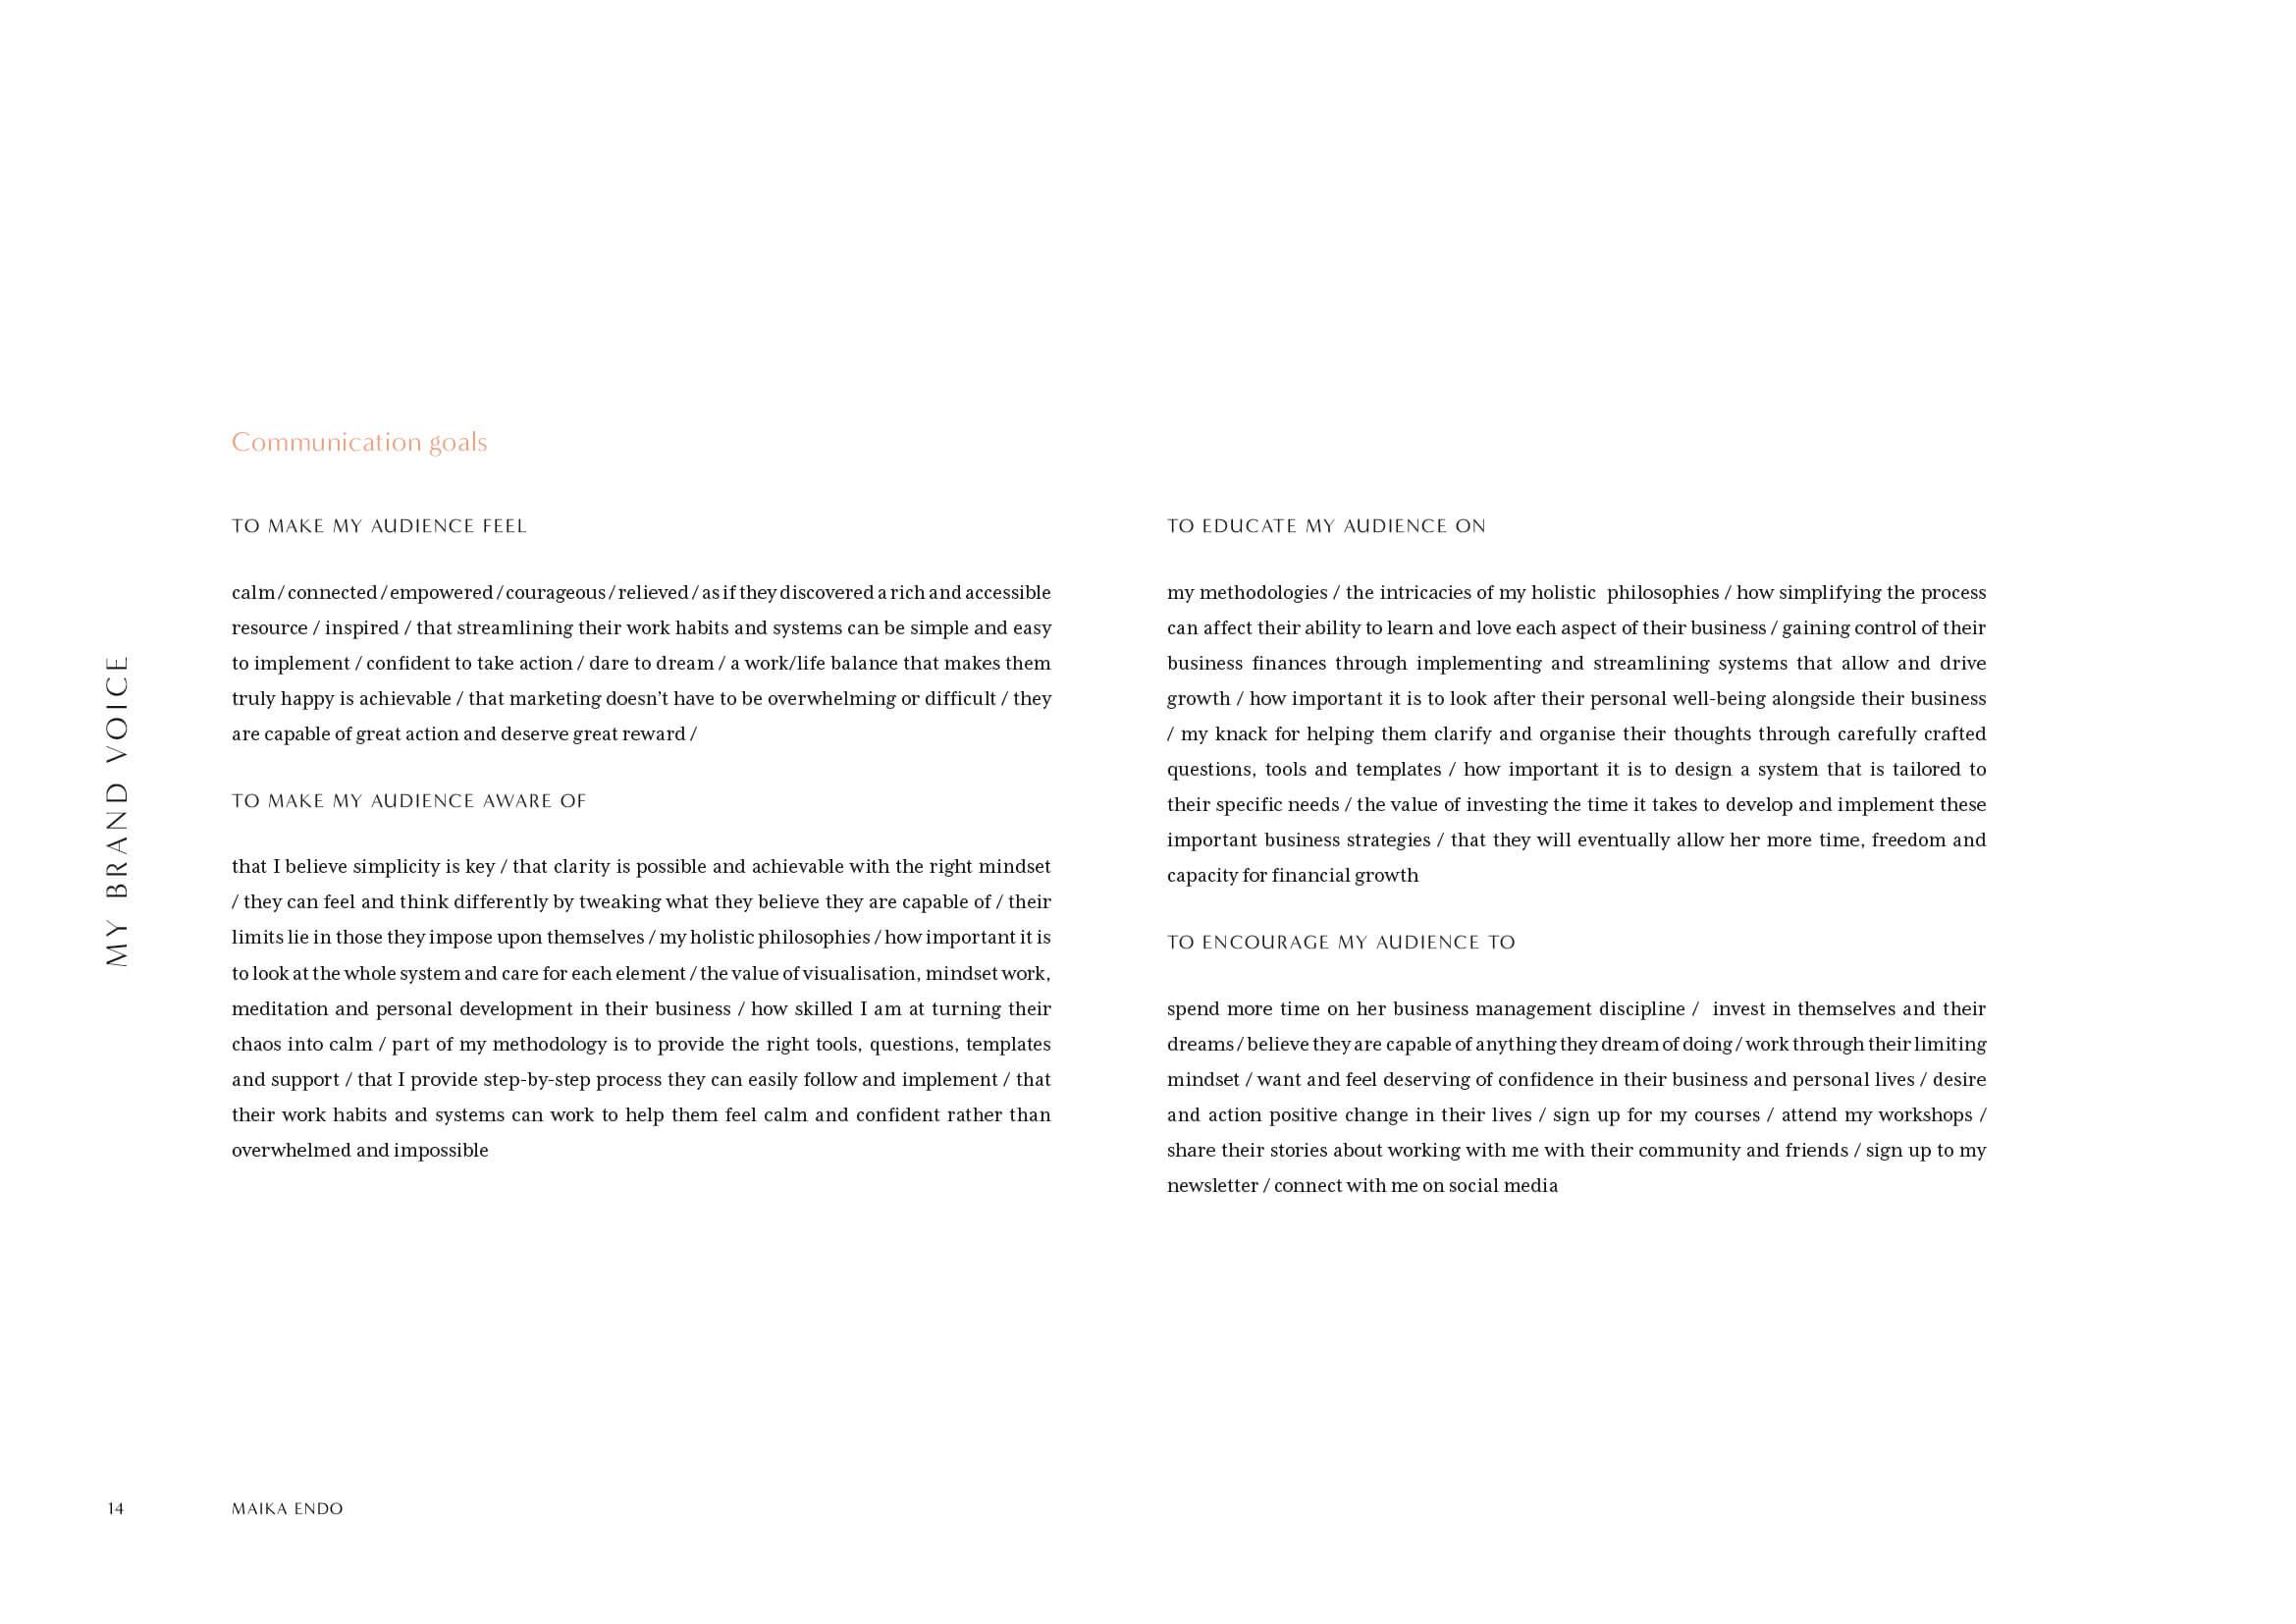 Maika Endo Strategy Manual14.jpg